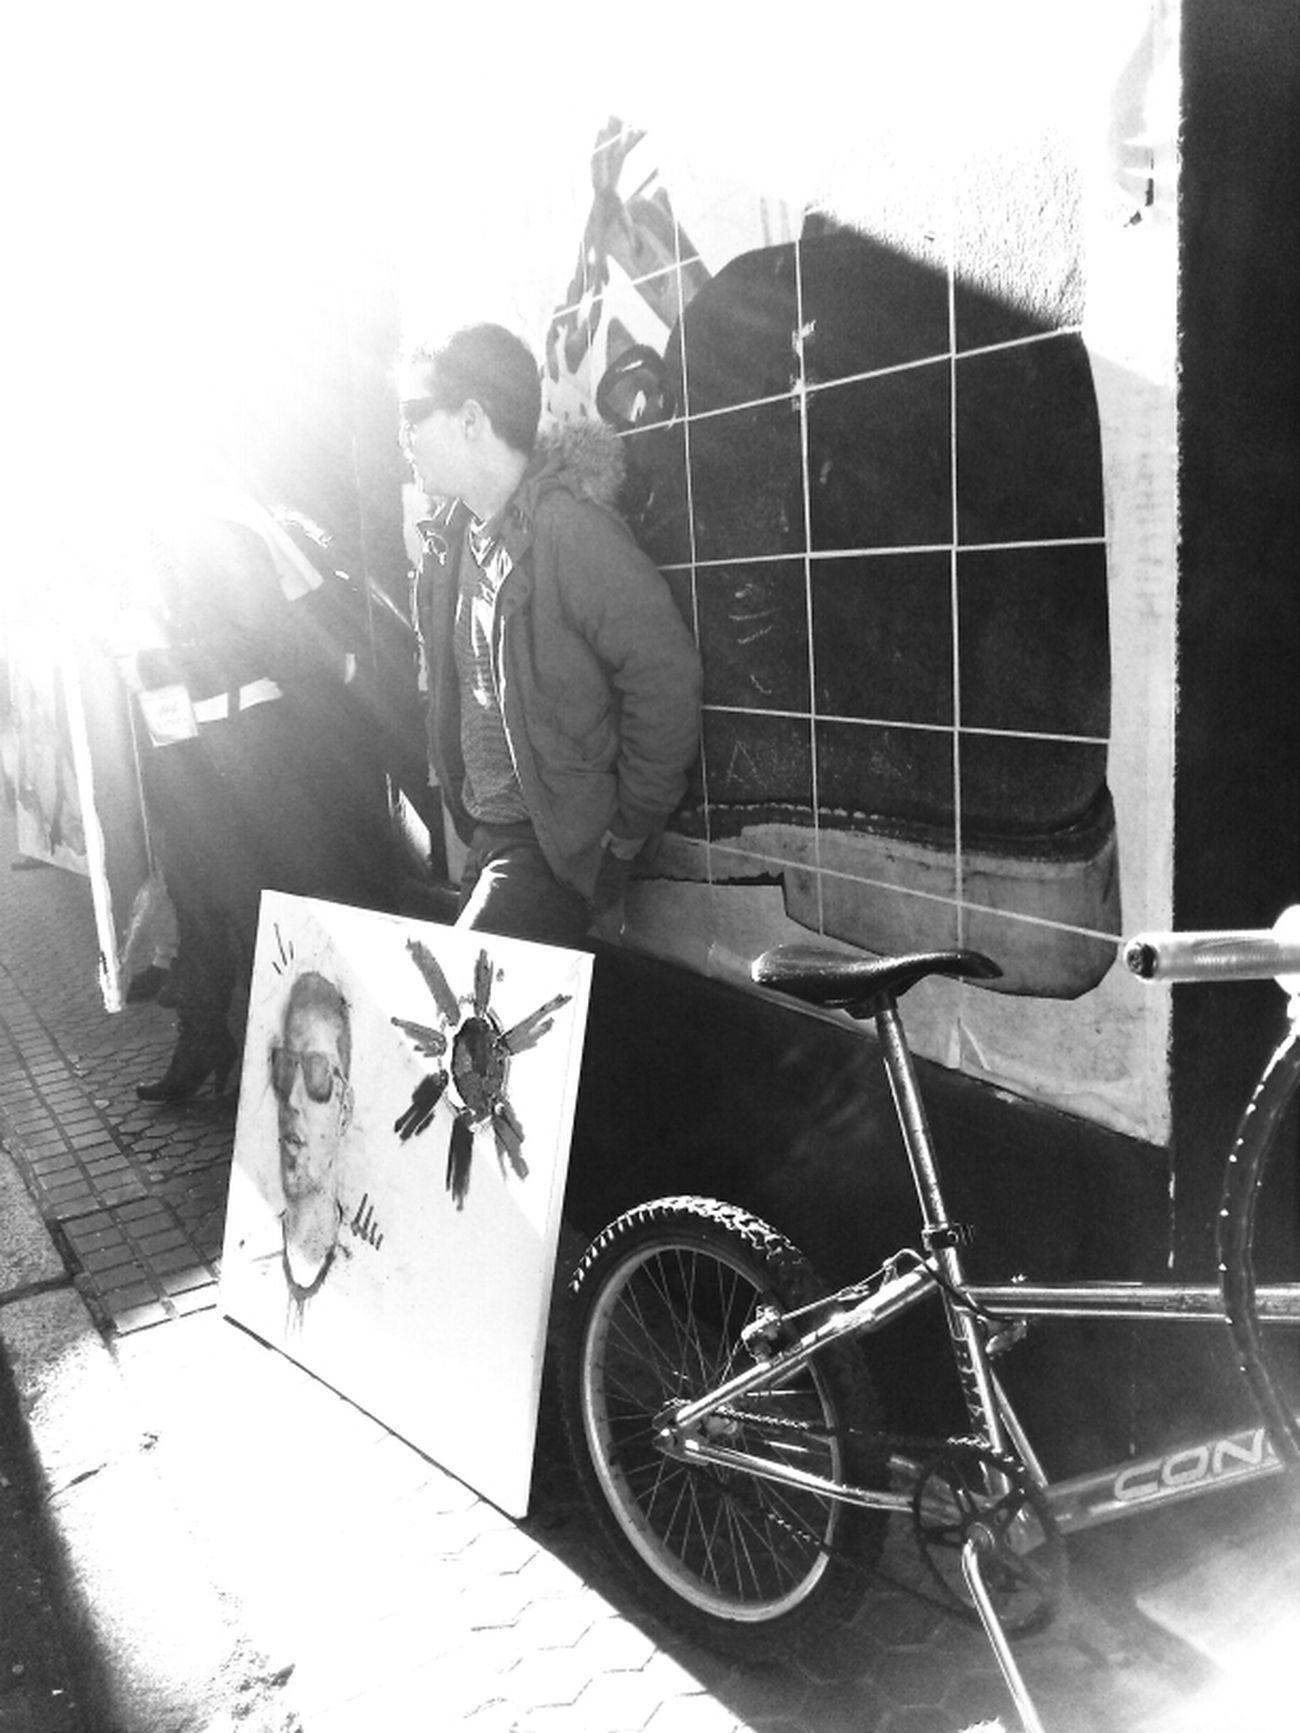 Streetphotography Blackandwhite Art Cicus